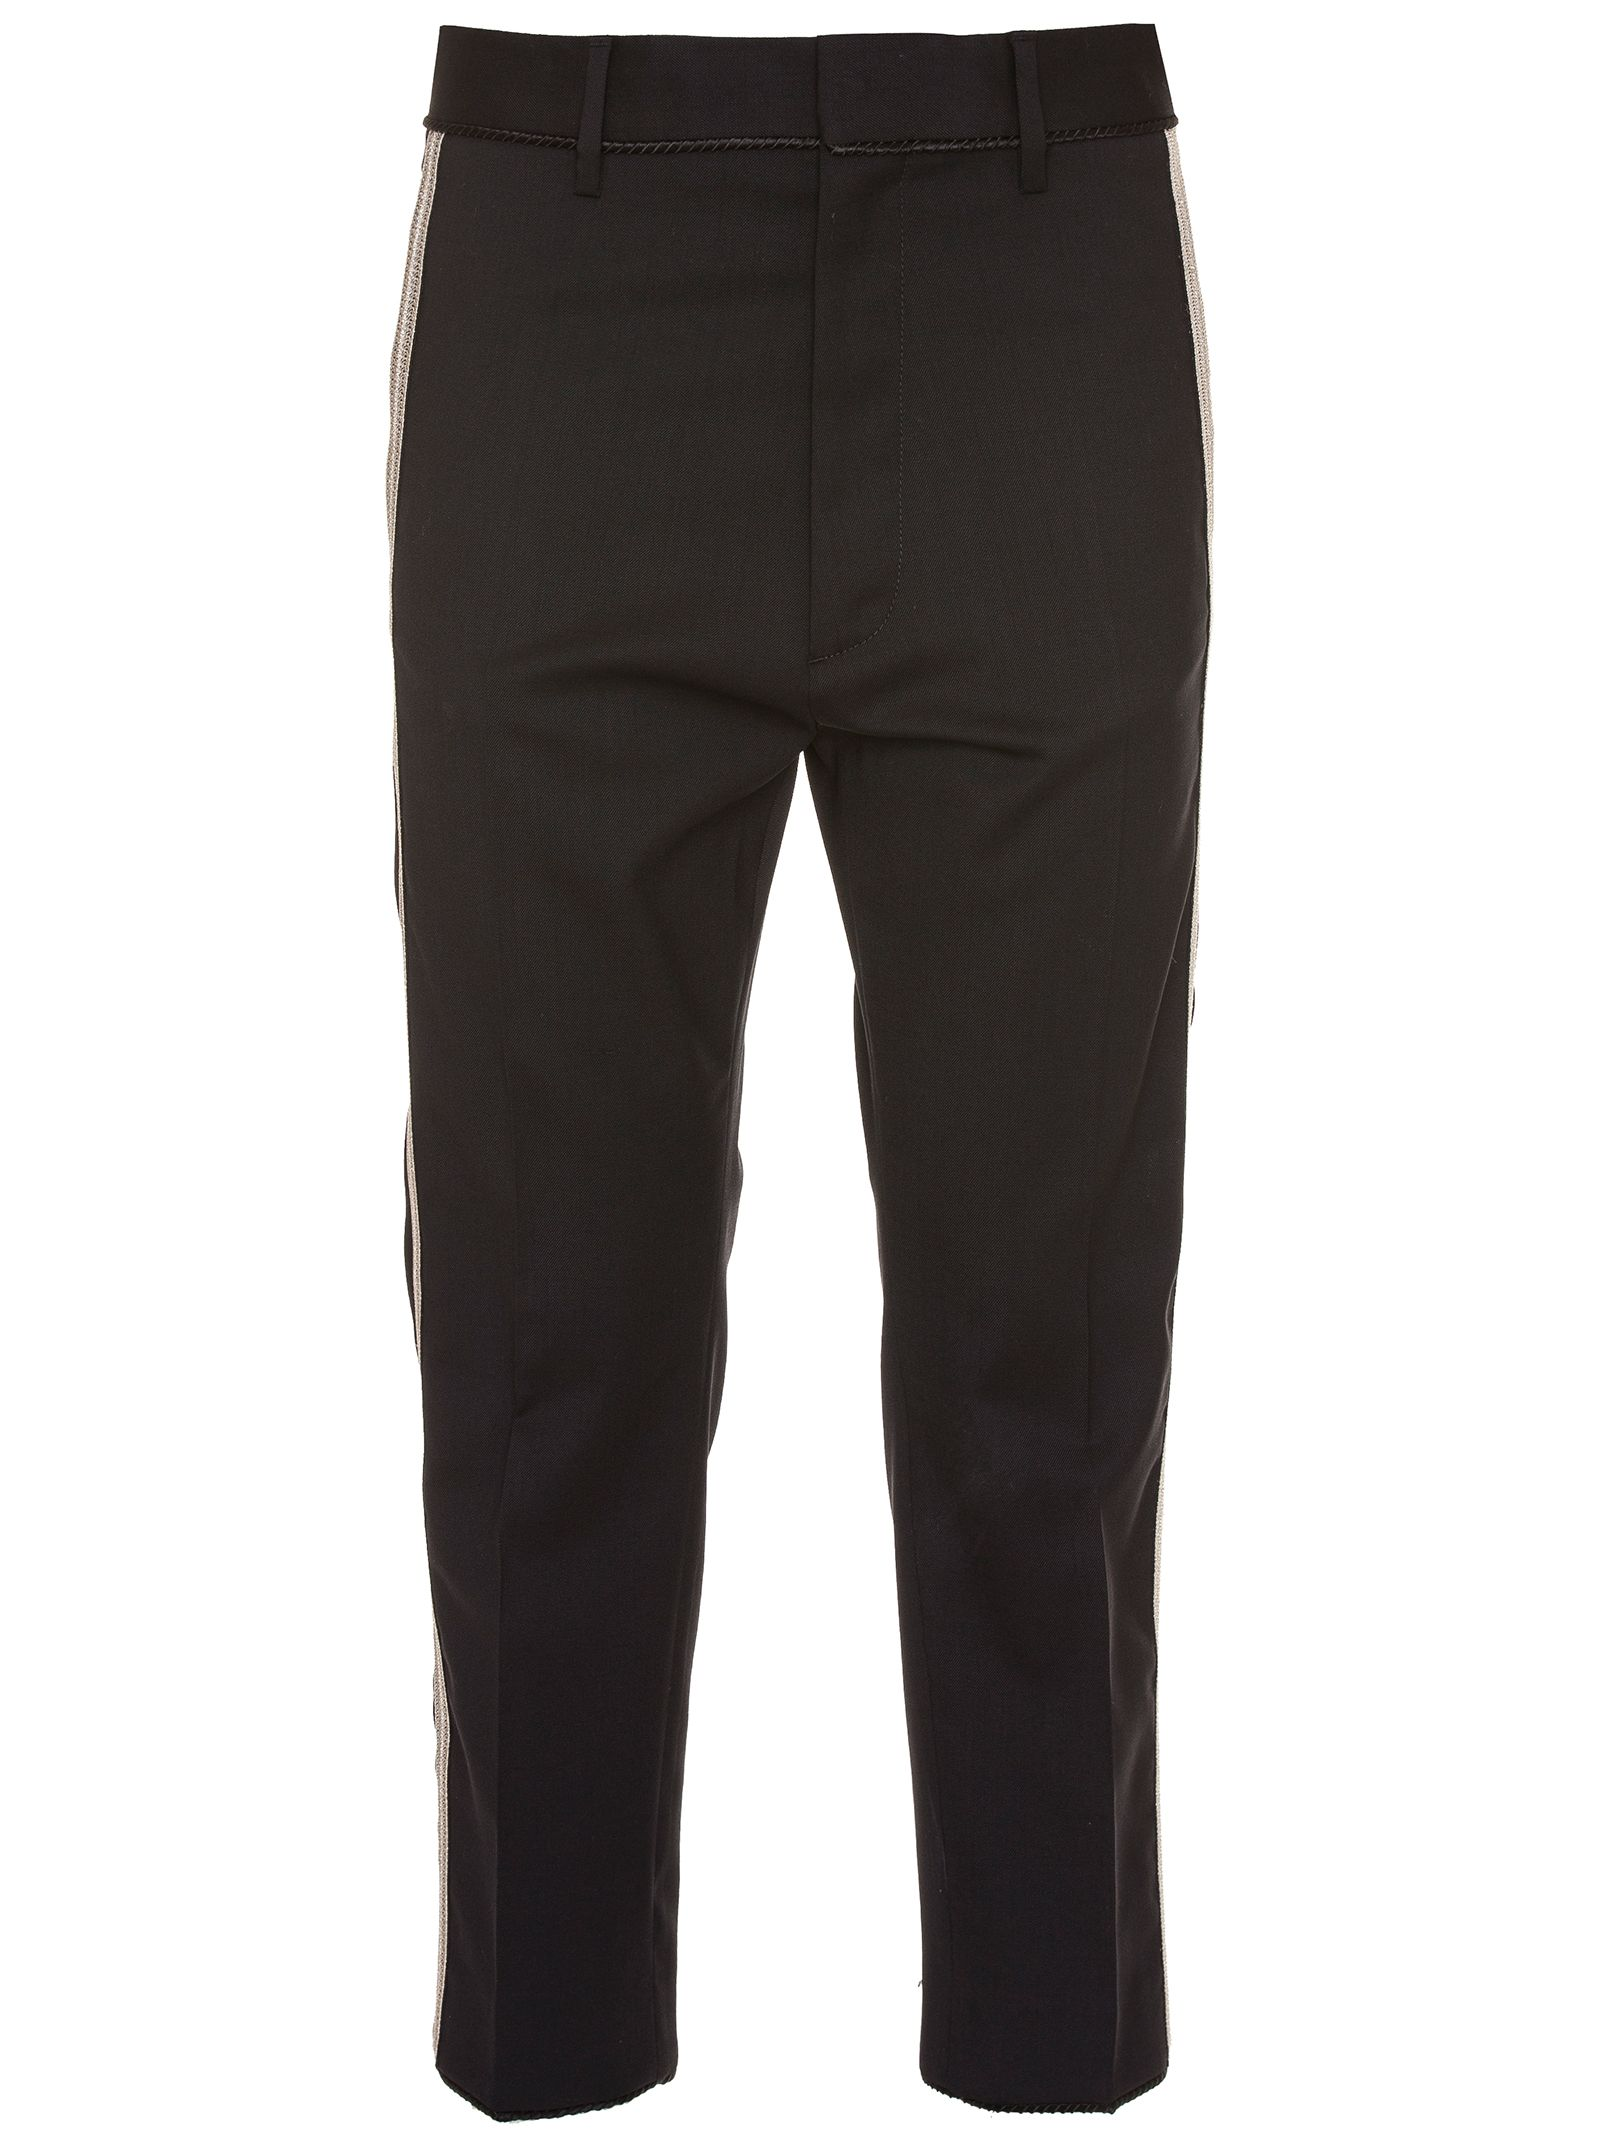 BLACK WOOL PANTS from Italist.com